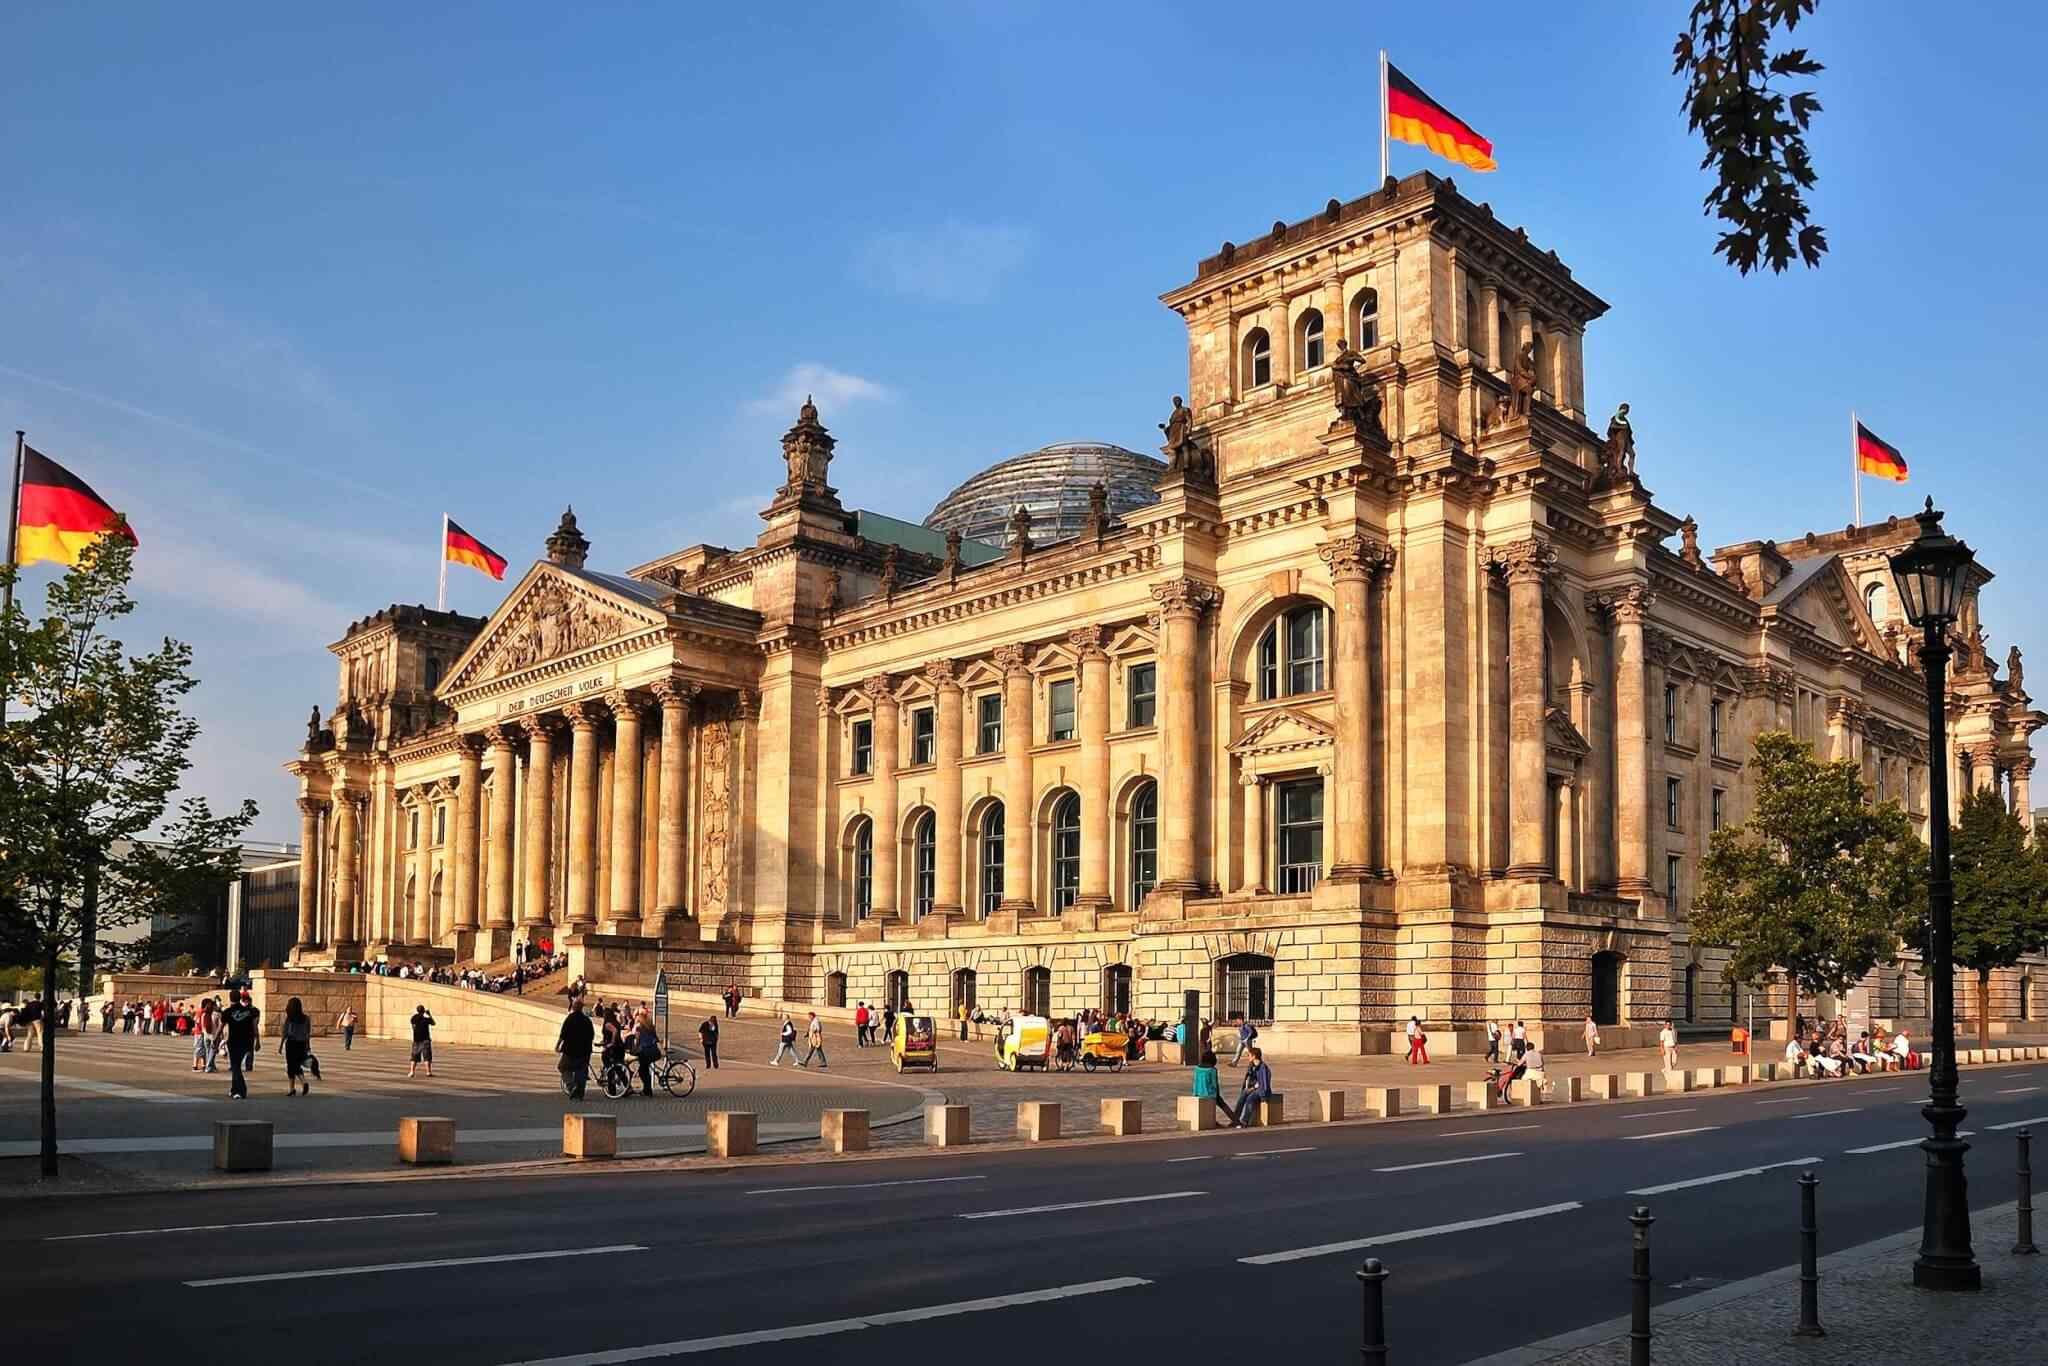 https://go2bulgaria.eu/wp-content/uploads/2018/09/destination-berlin-01.jpg